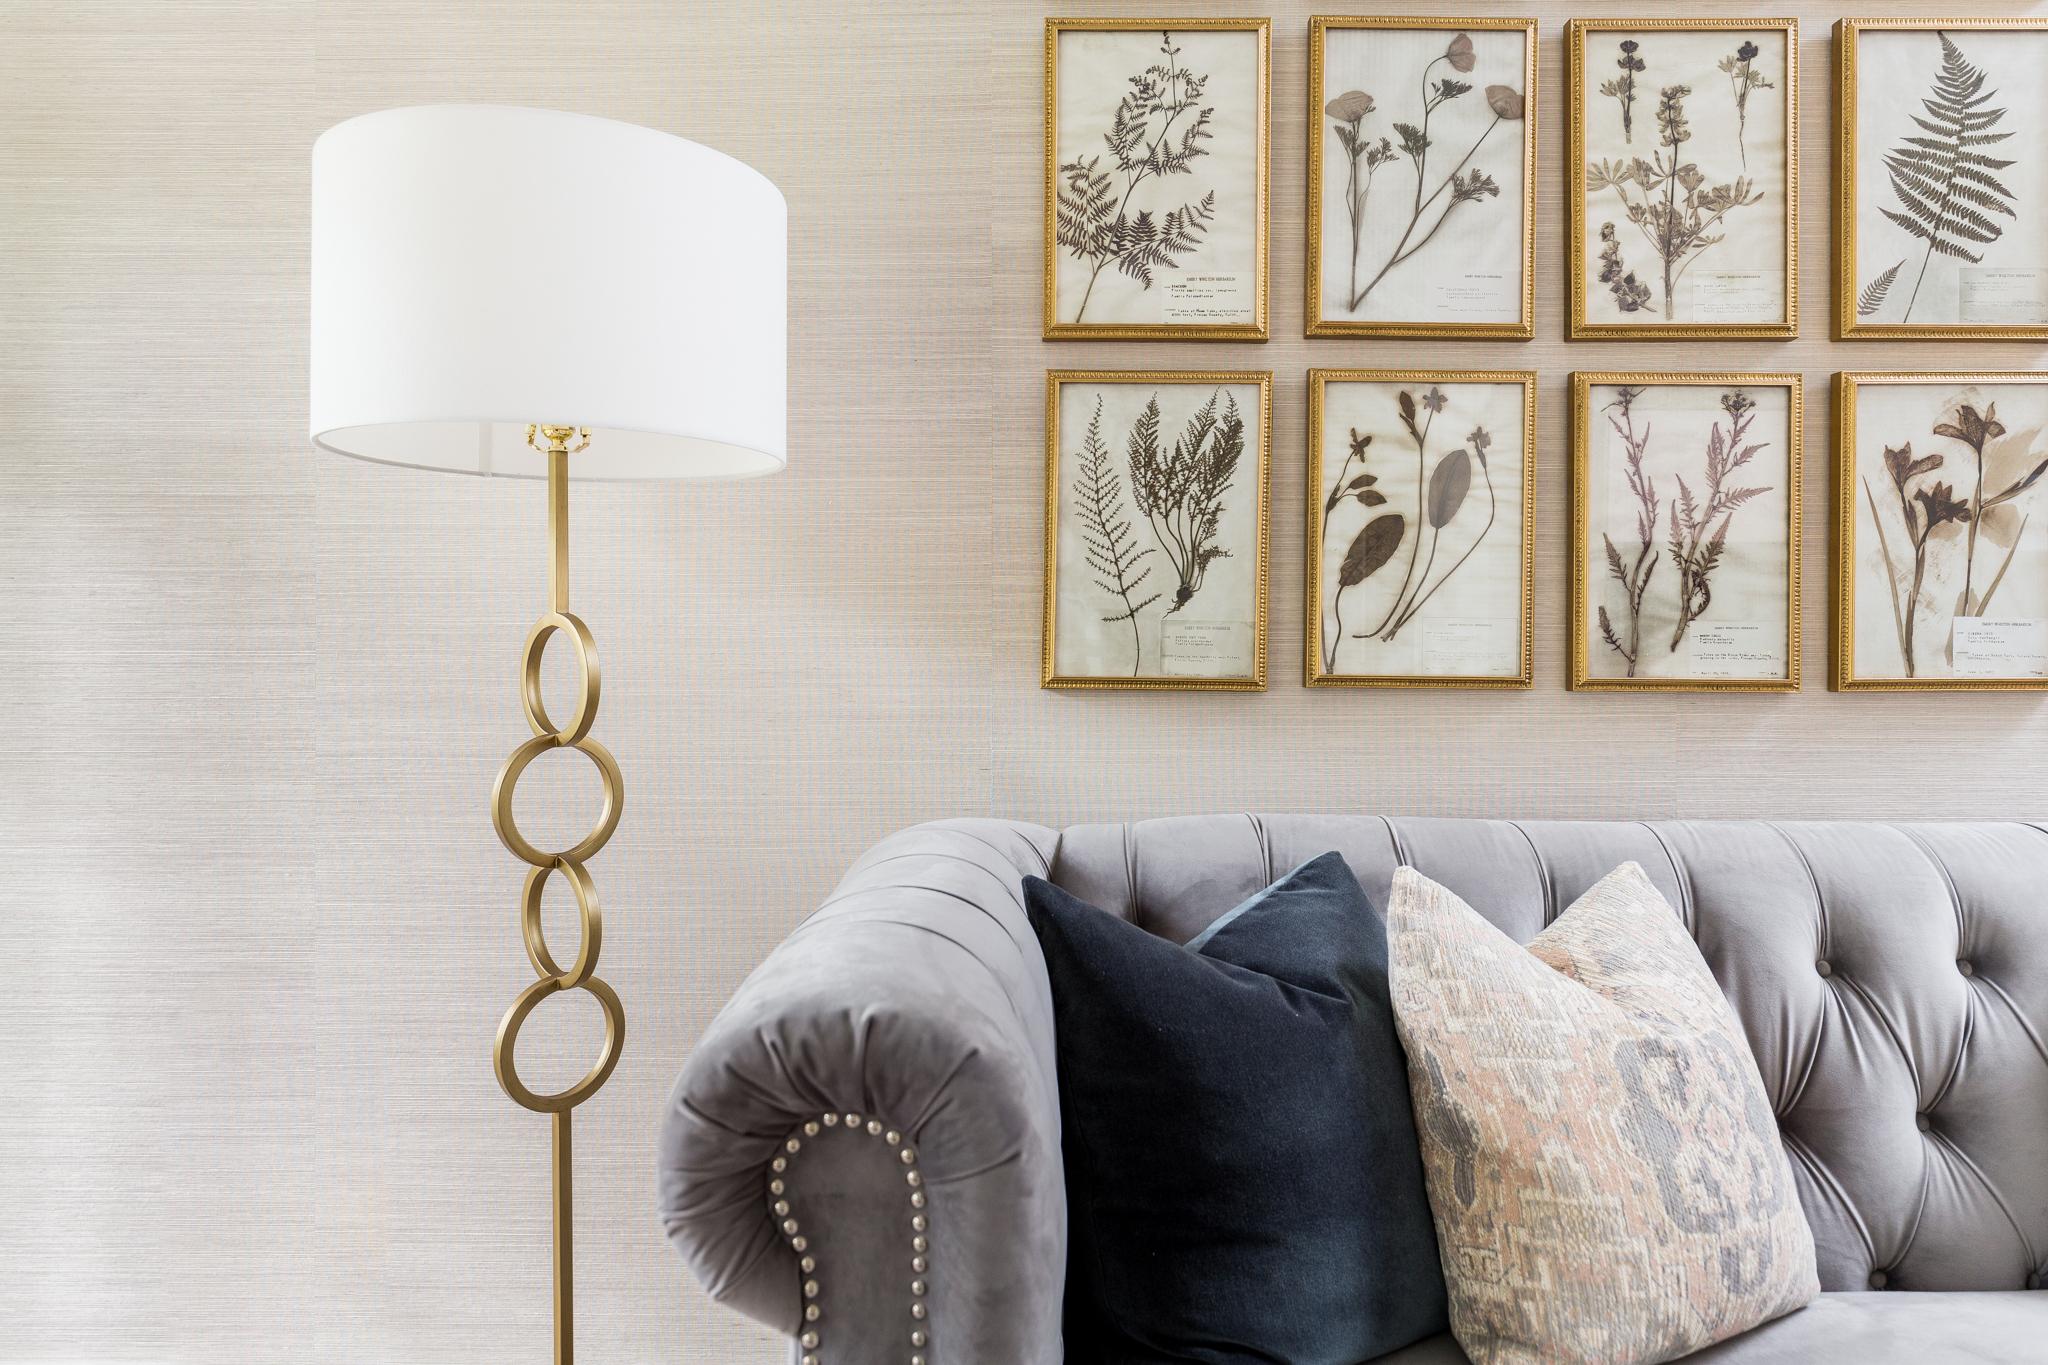 Transitional Grasscloth Wallpaper - Lacey Michalek